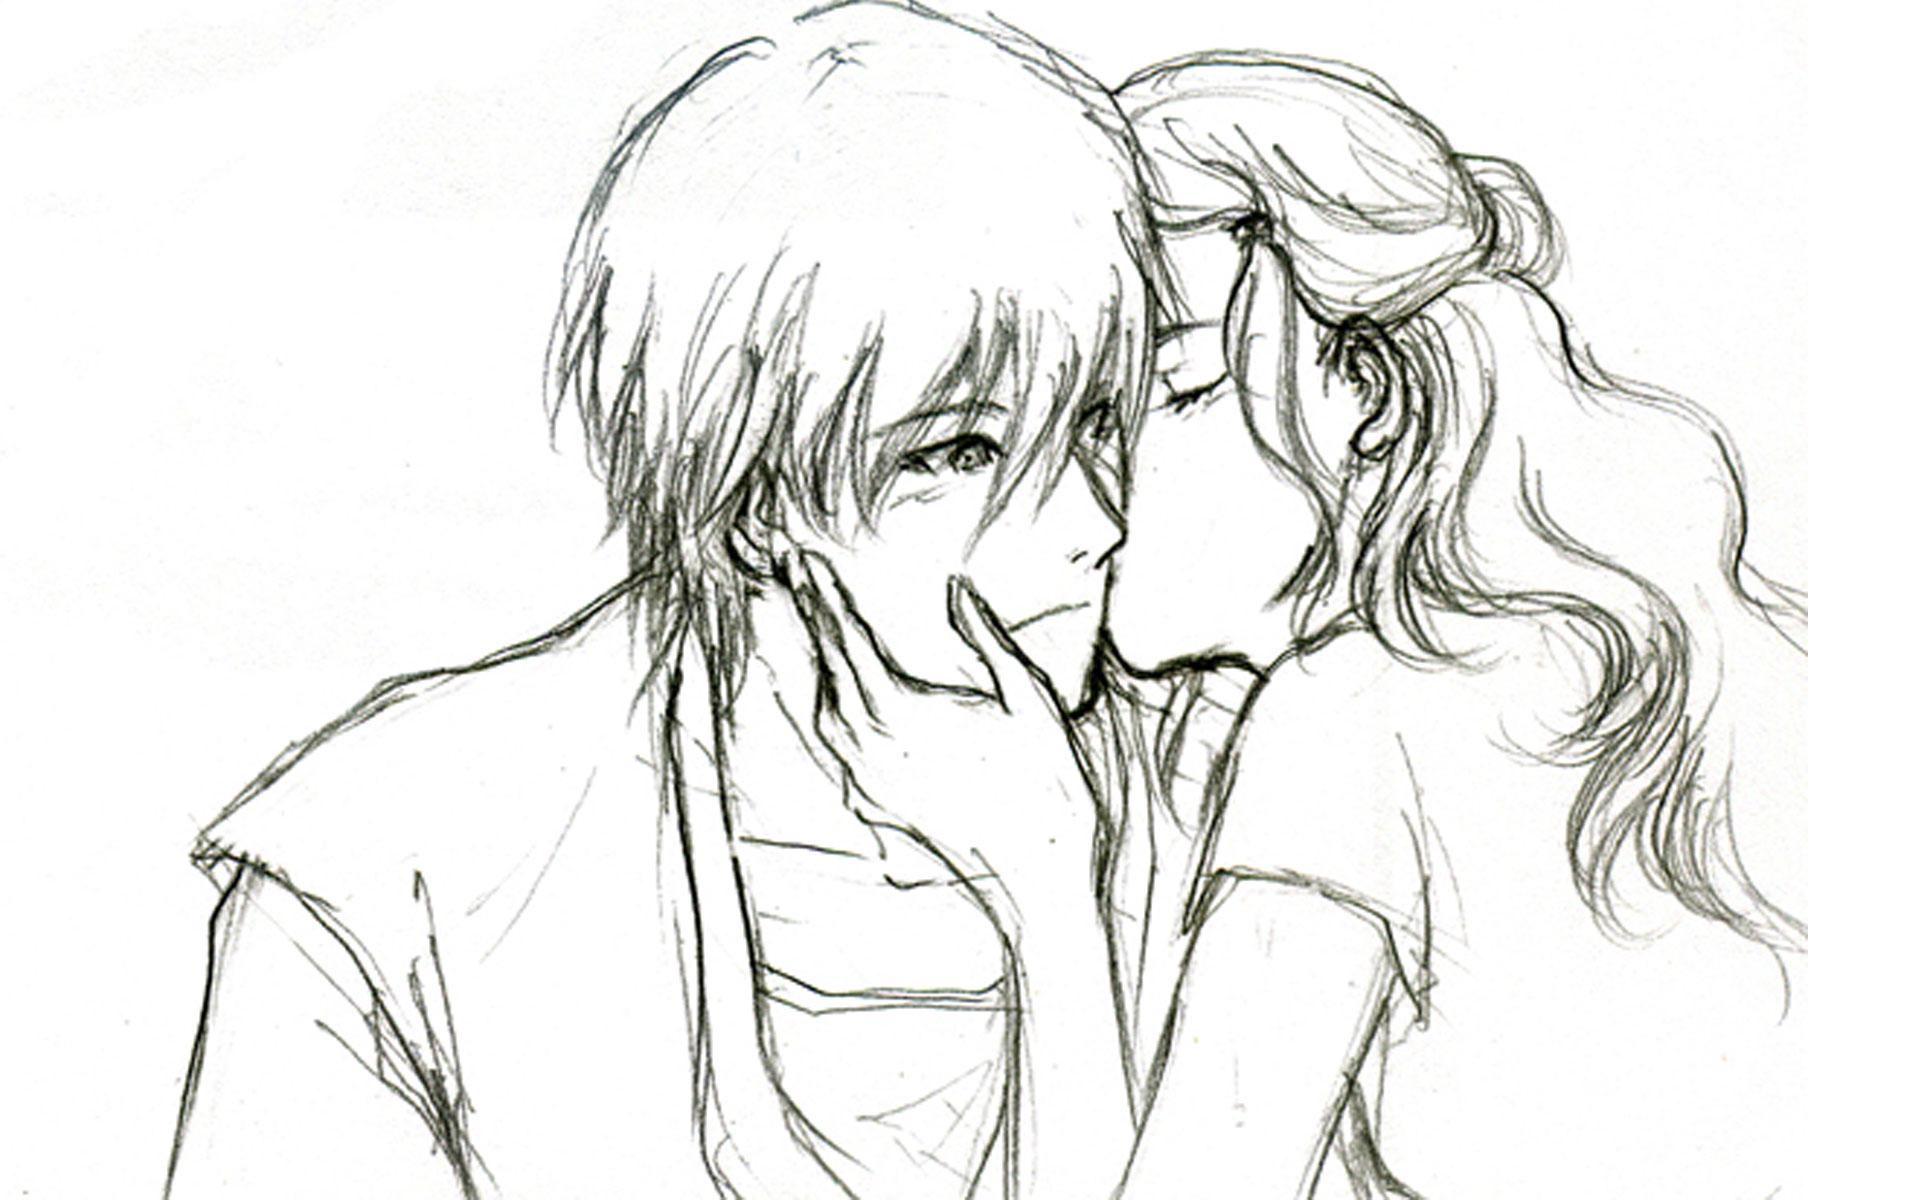 1920x1200 How To Start A Pencil Sketch Girl Start Kissing Boy Pencil